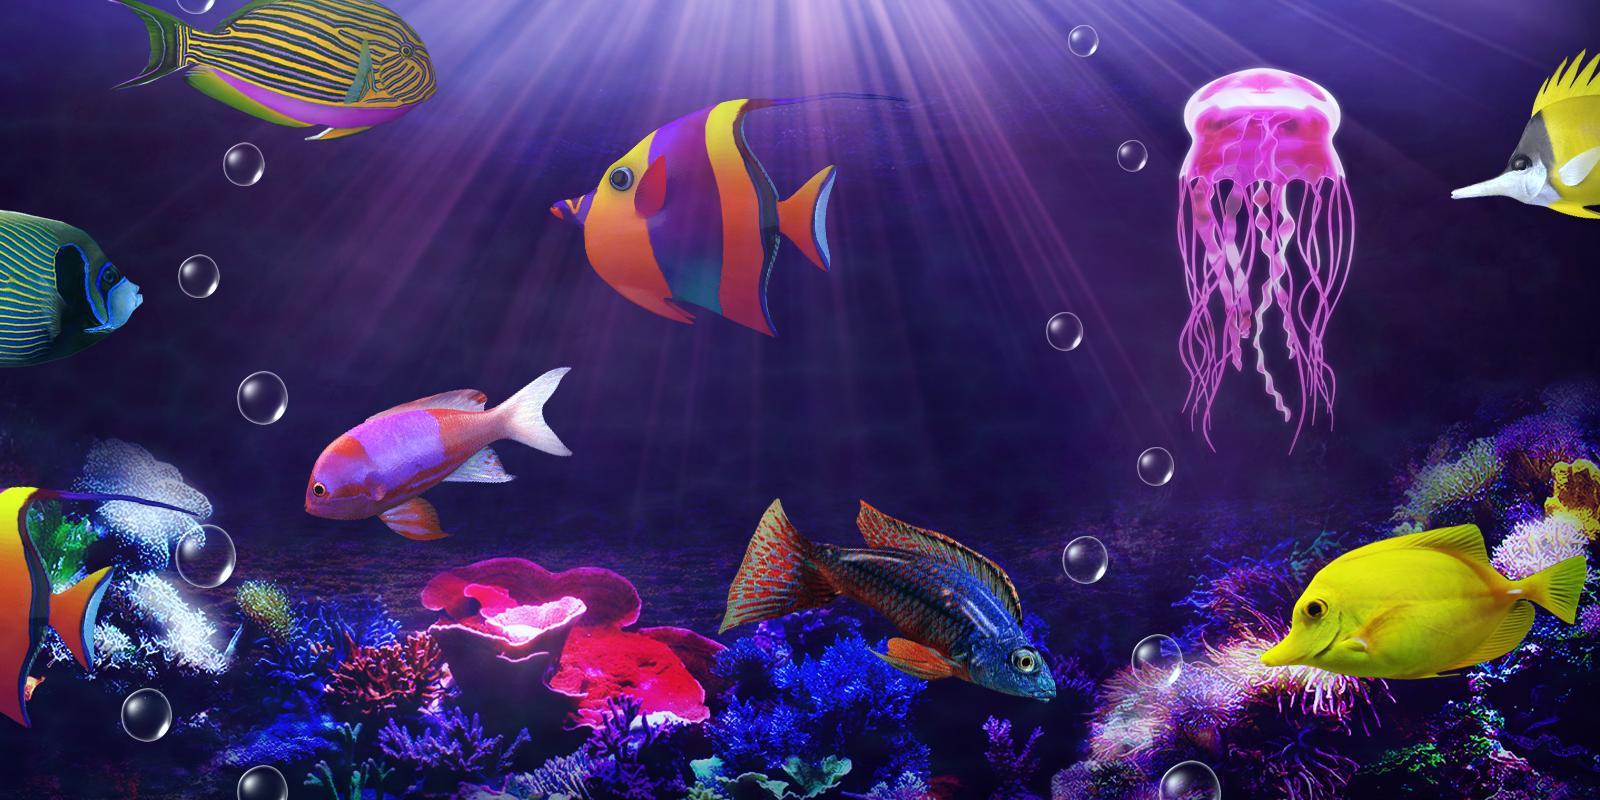 застройка картинки с анимациями рыбками других исполнениях